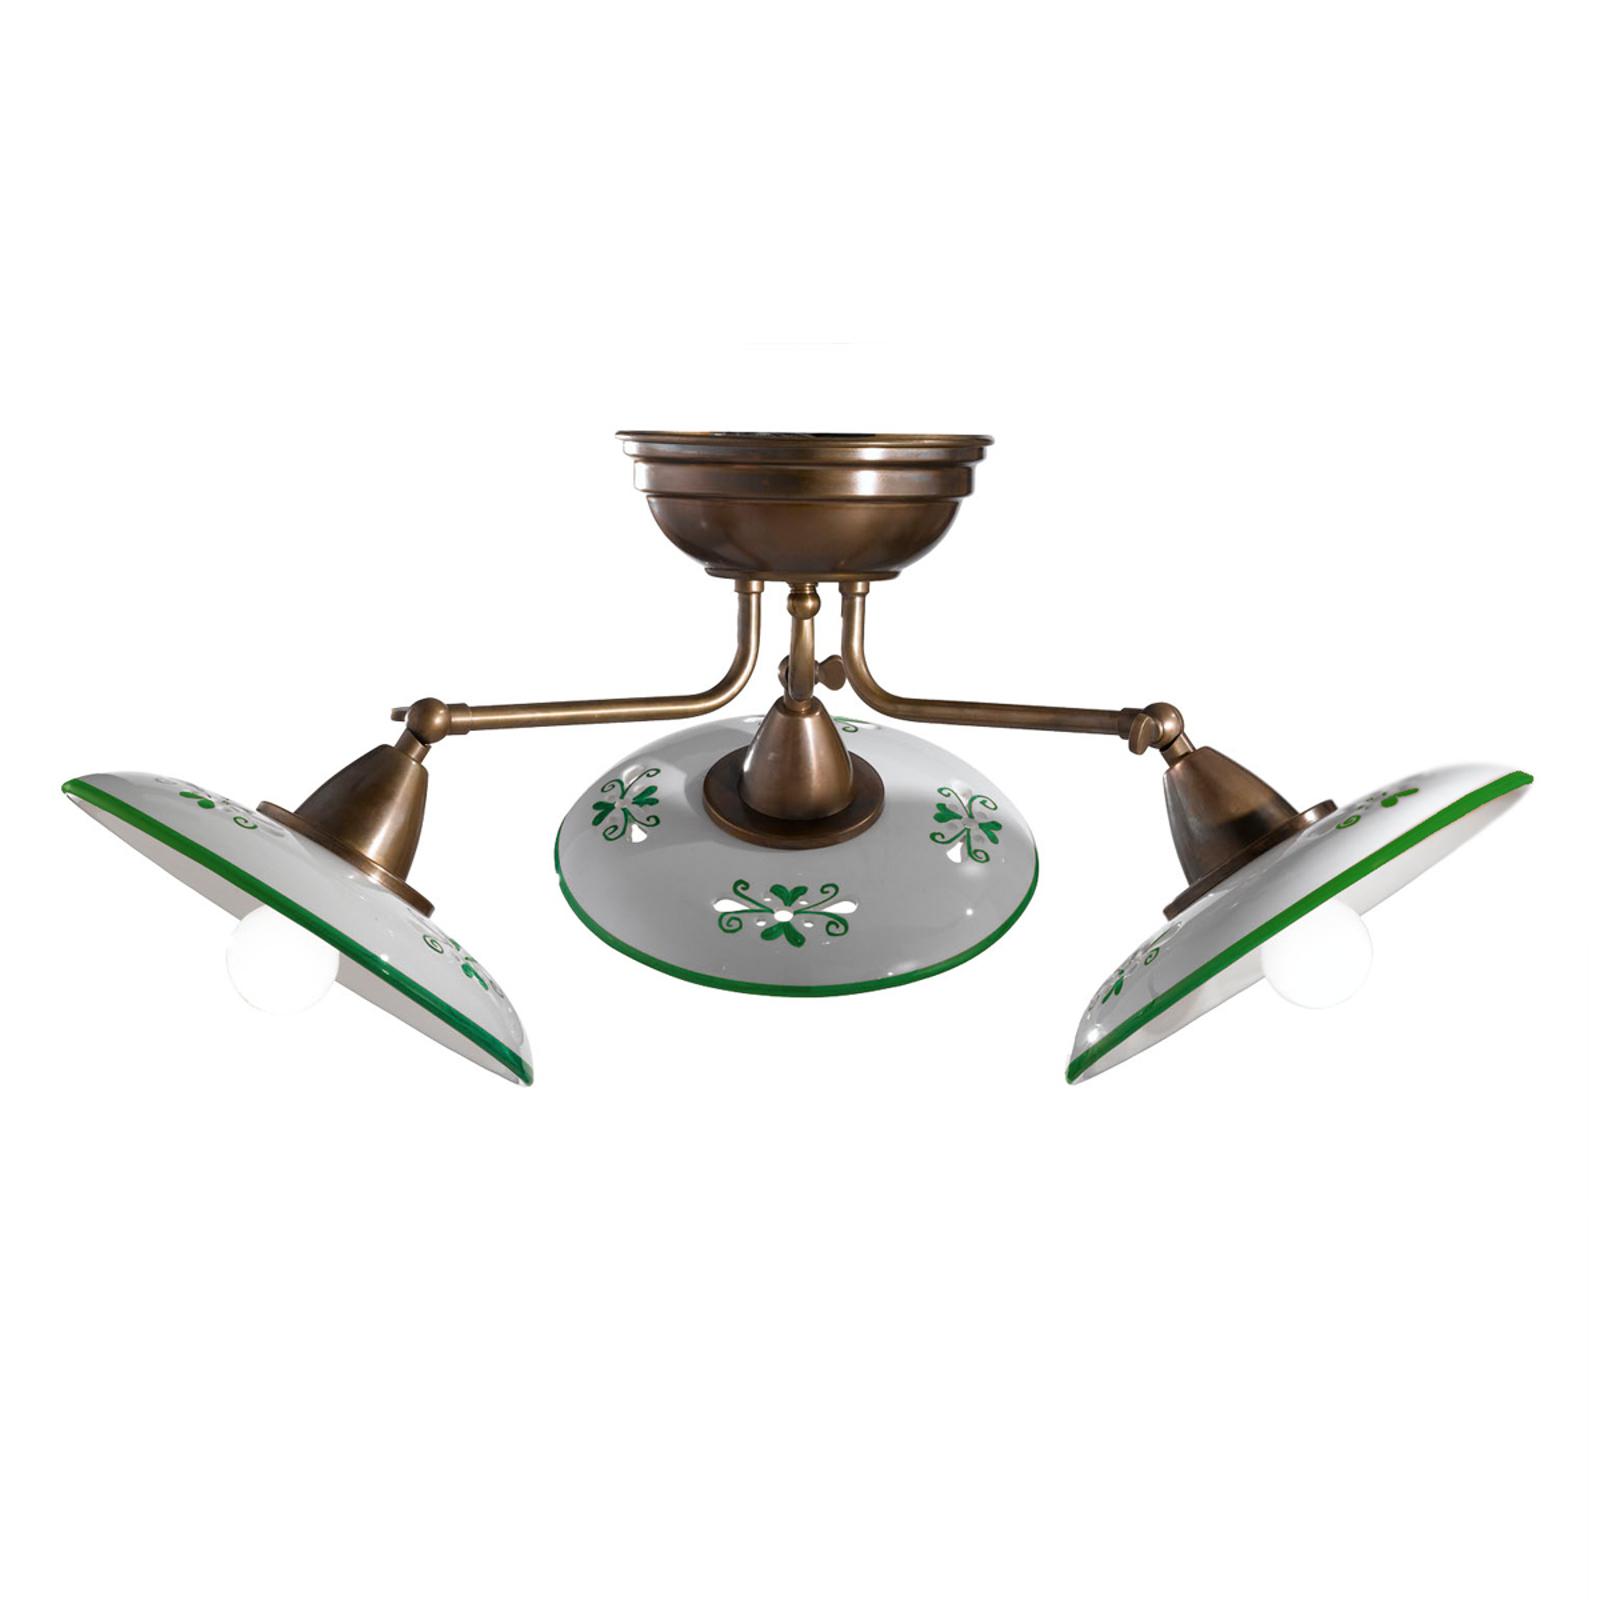 Bassano - 3-lichts keramiek plafondlamp, groen